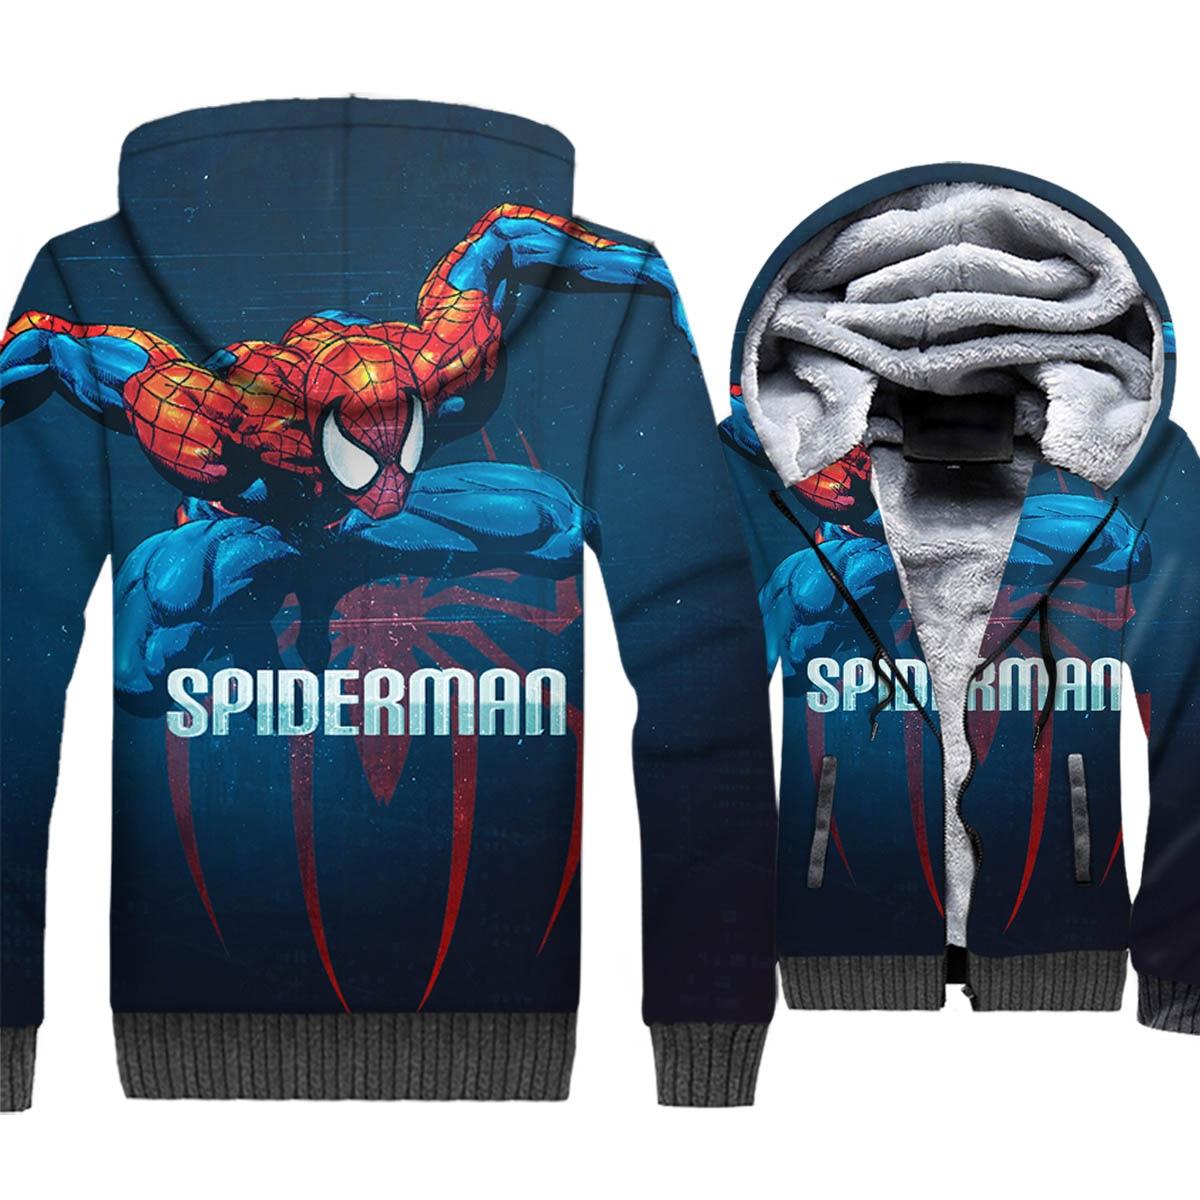 Super Hero Spider Man Jacket Hoodie Men Funny Sweatshirt Winter Thick Fleece Zipper 3D Print Coat Cool Sportswear Brand Clothing